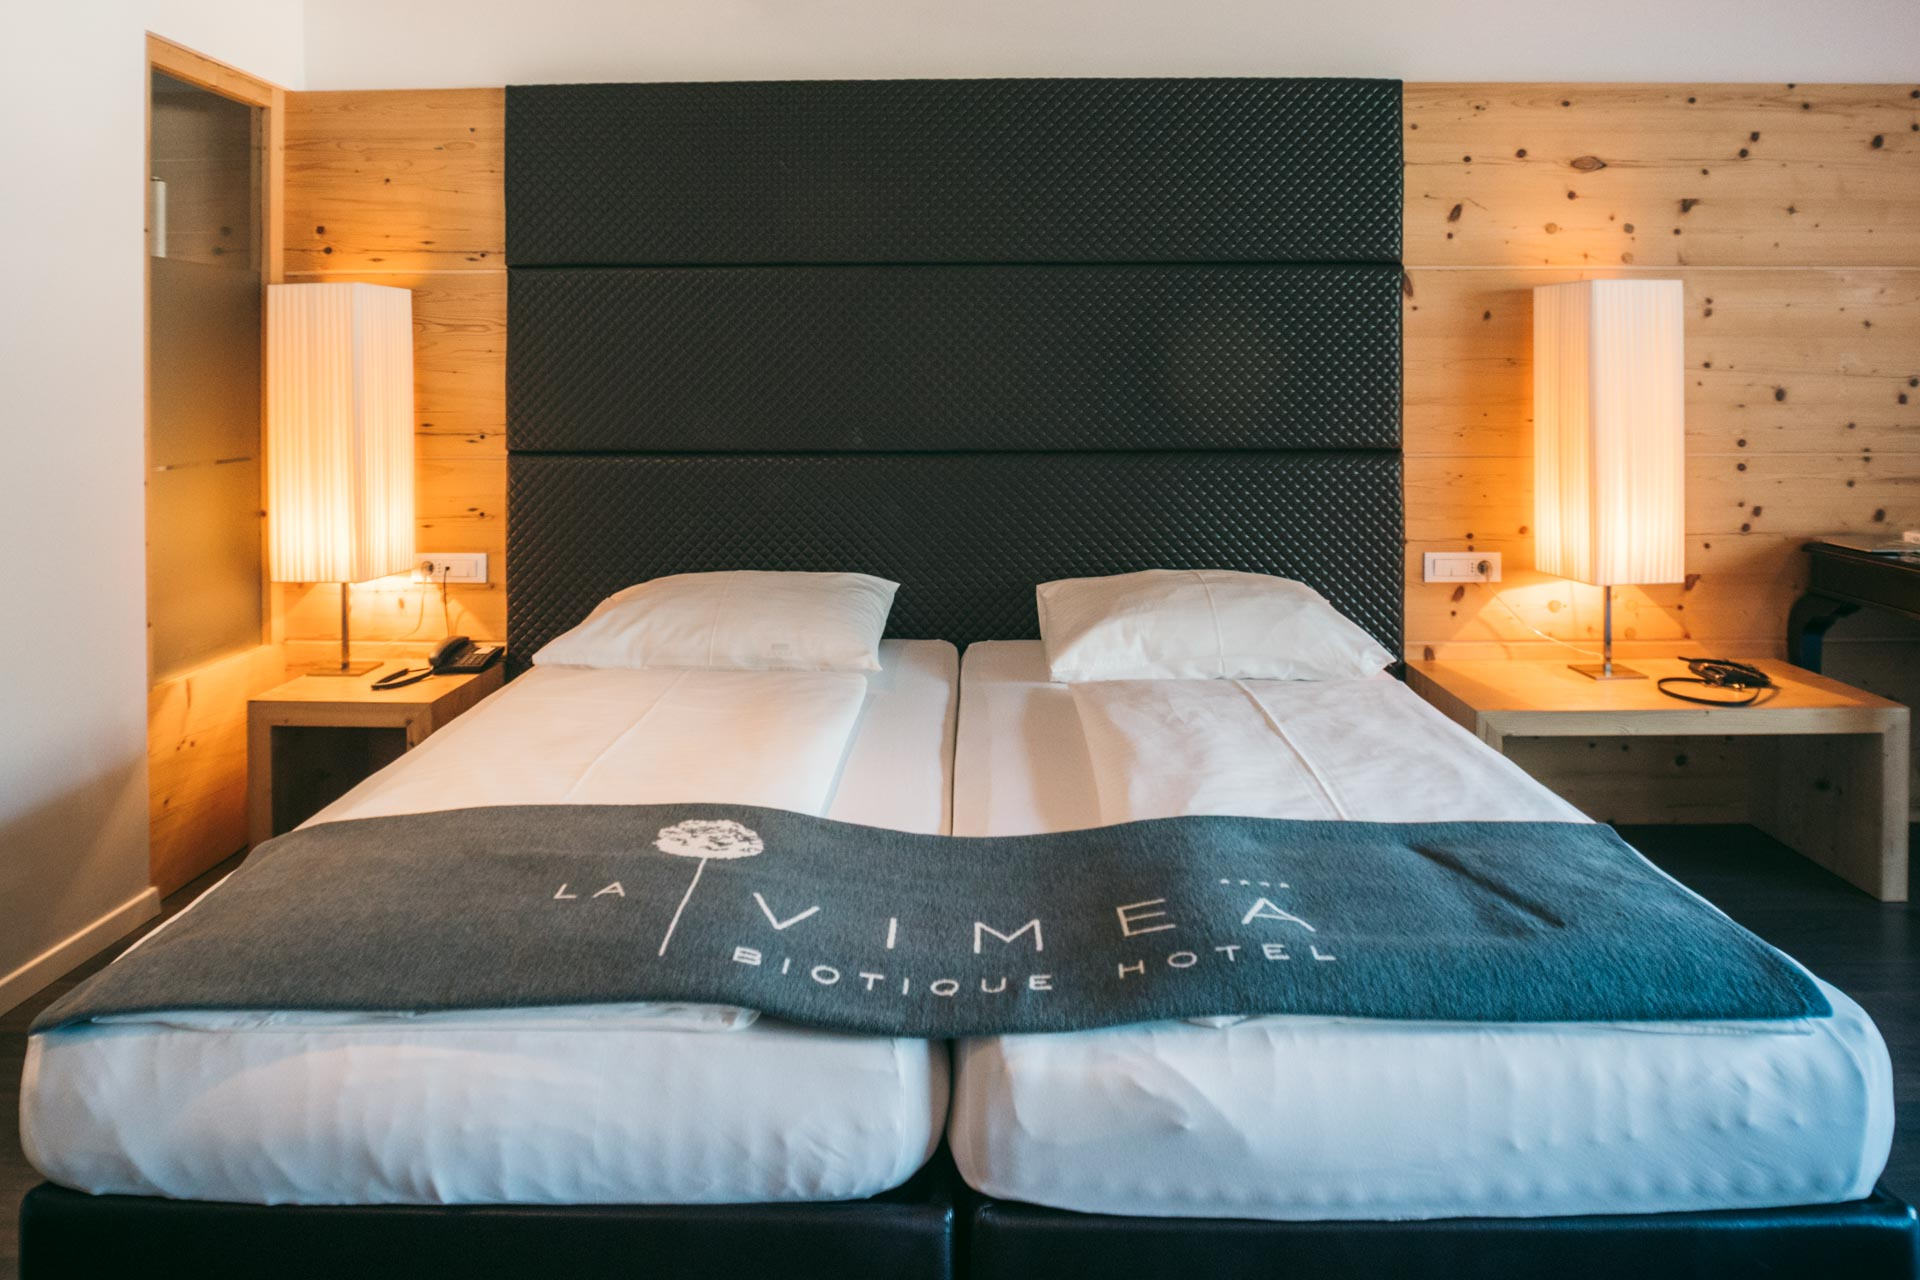 LA VIMEA beds